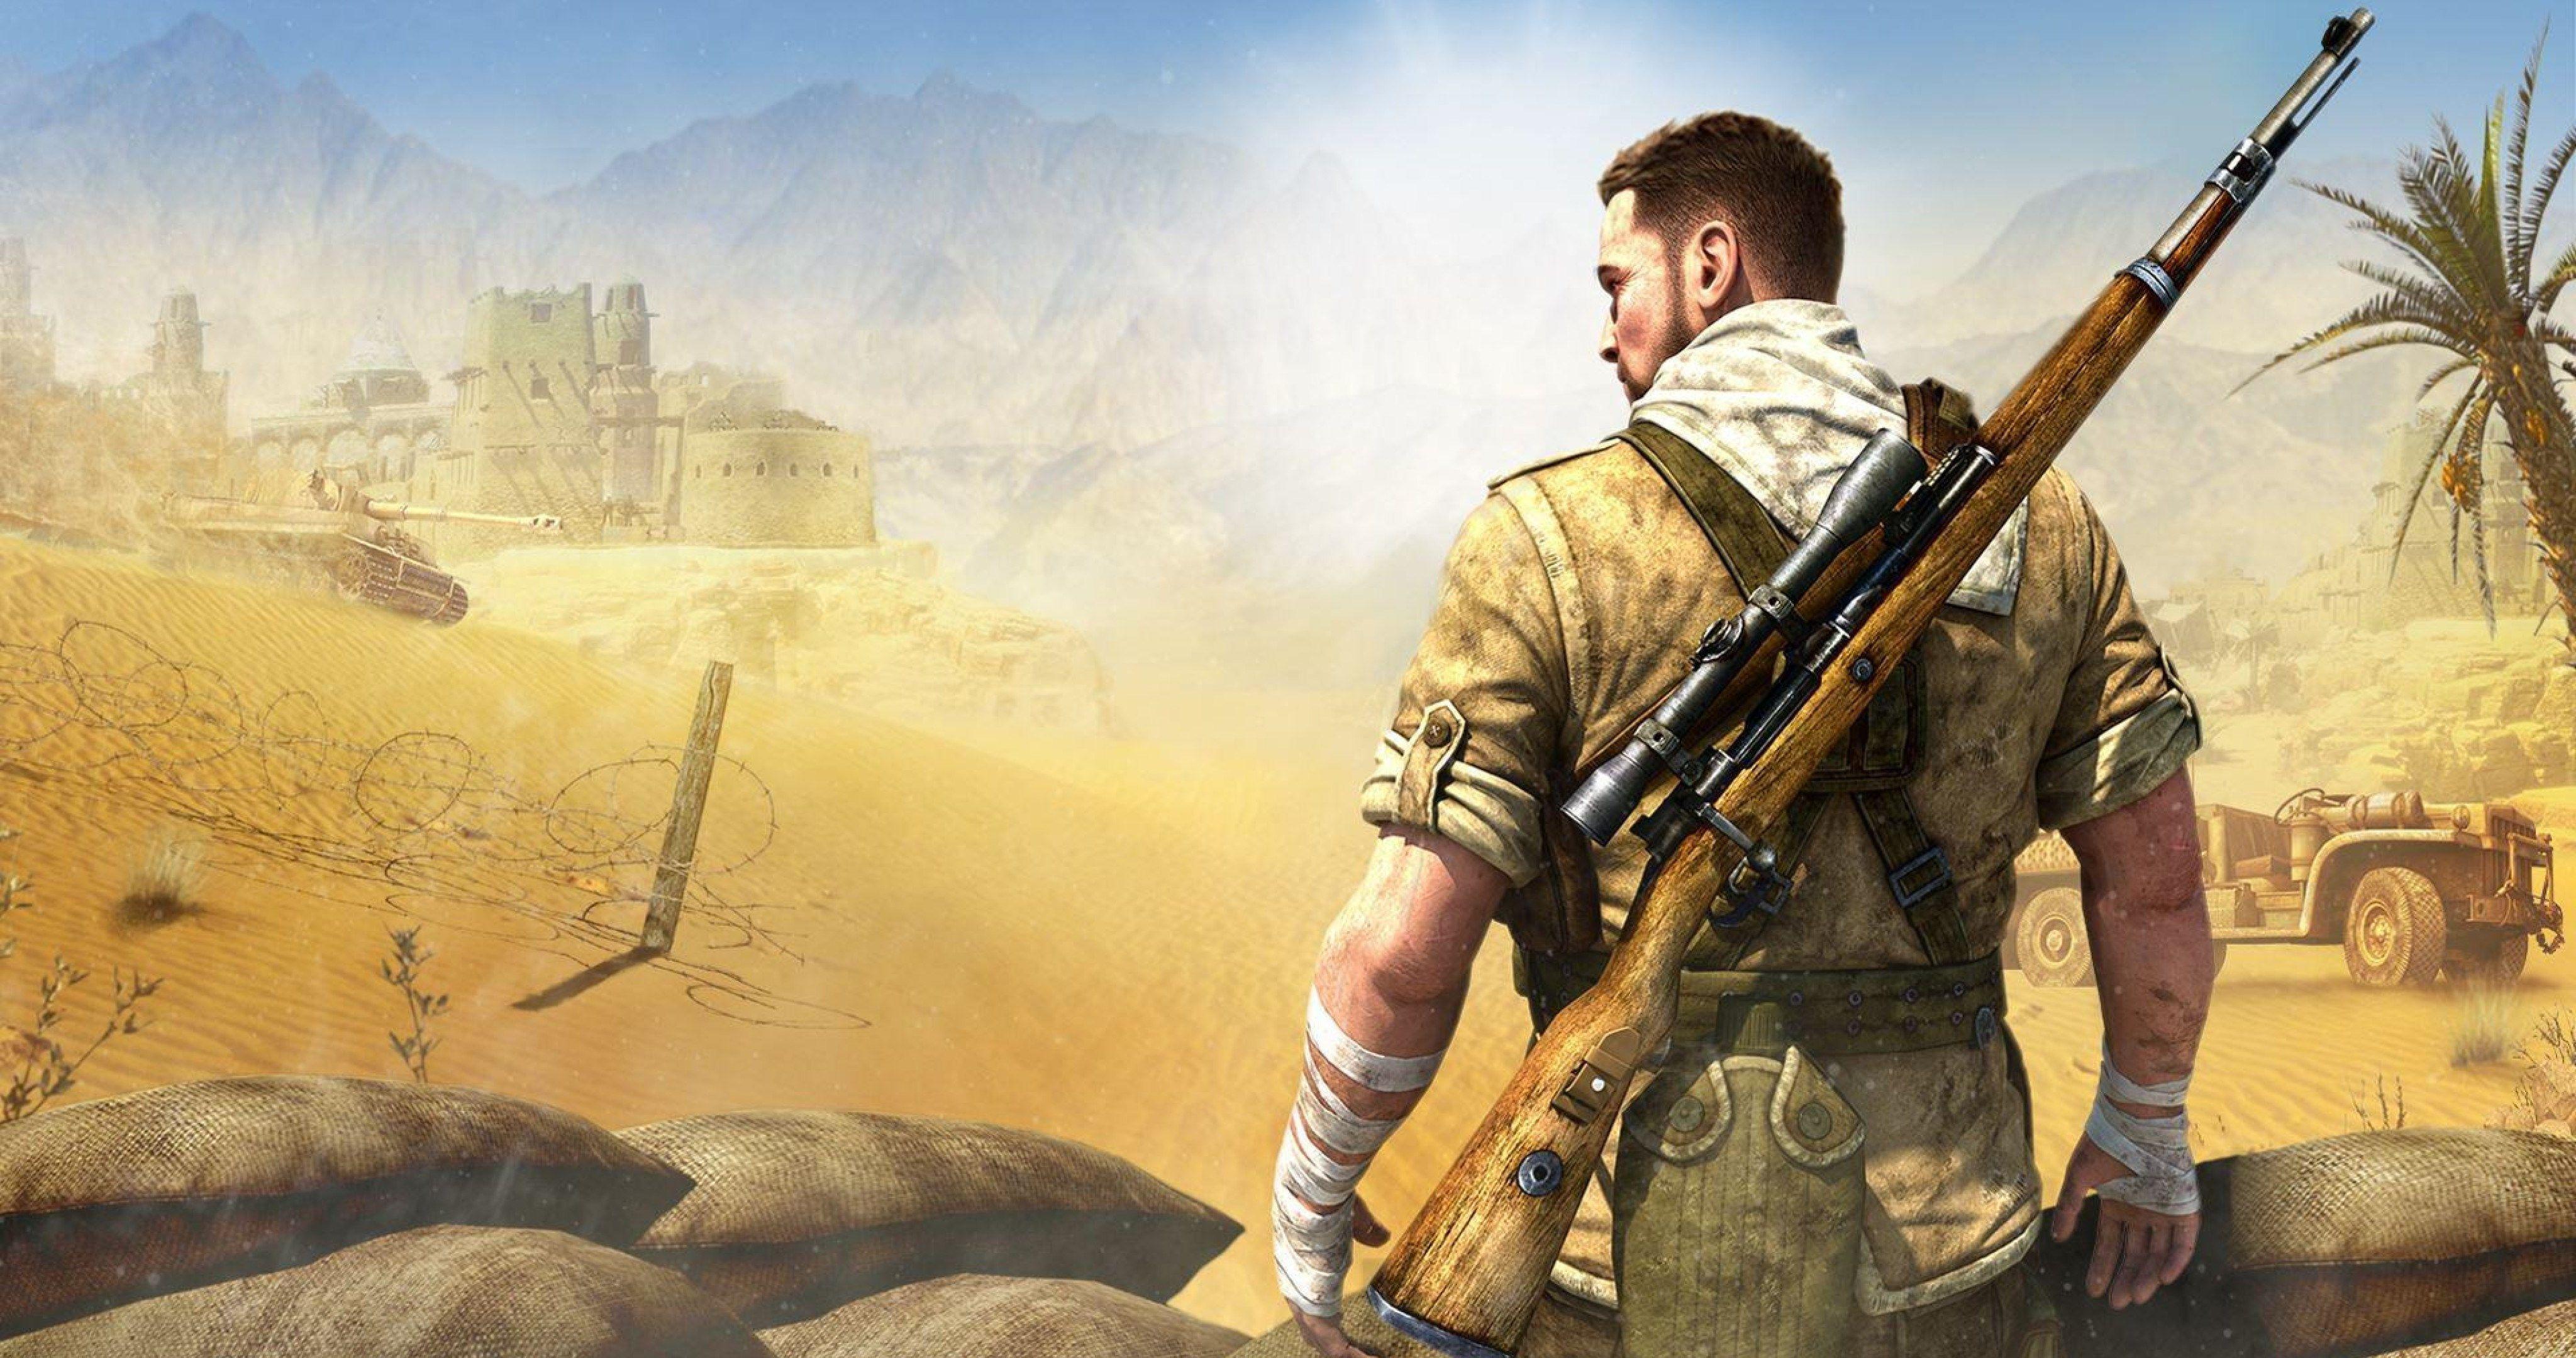 sniper elite 3 video game 4k ultra hd wallpaper ololoshenka 4096x2160